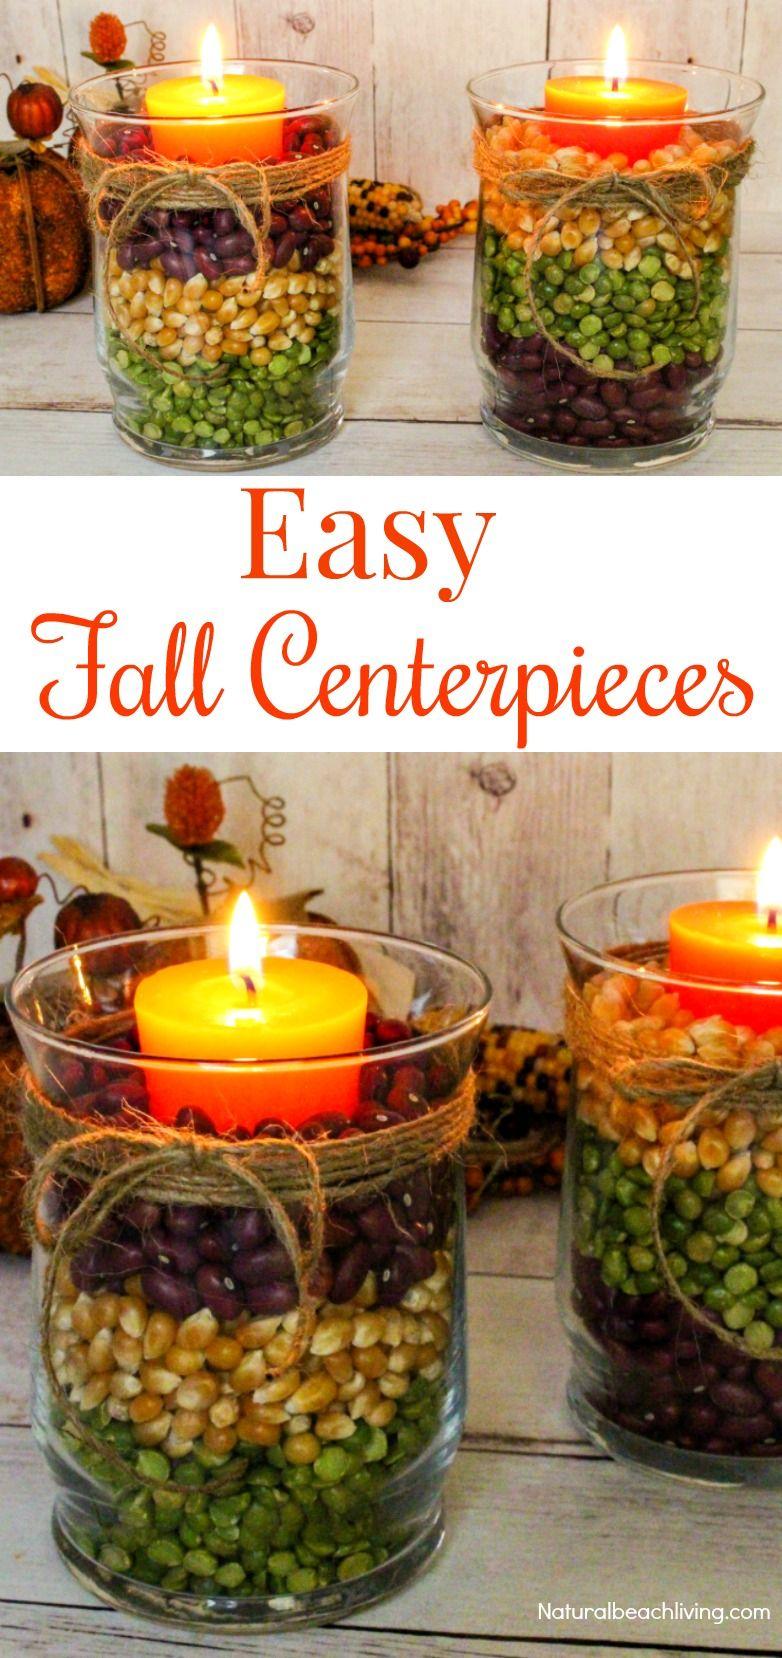 Harvest Centerpieces For Fall Decor